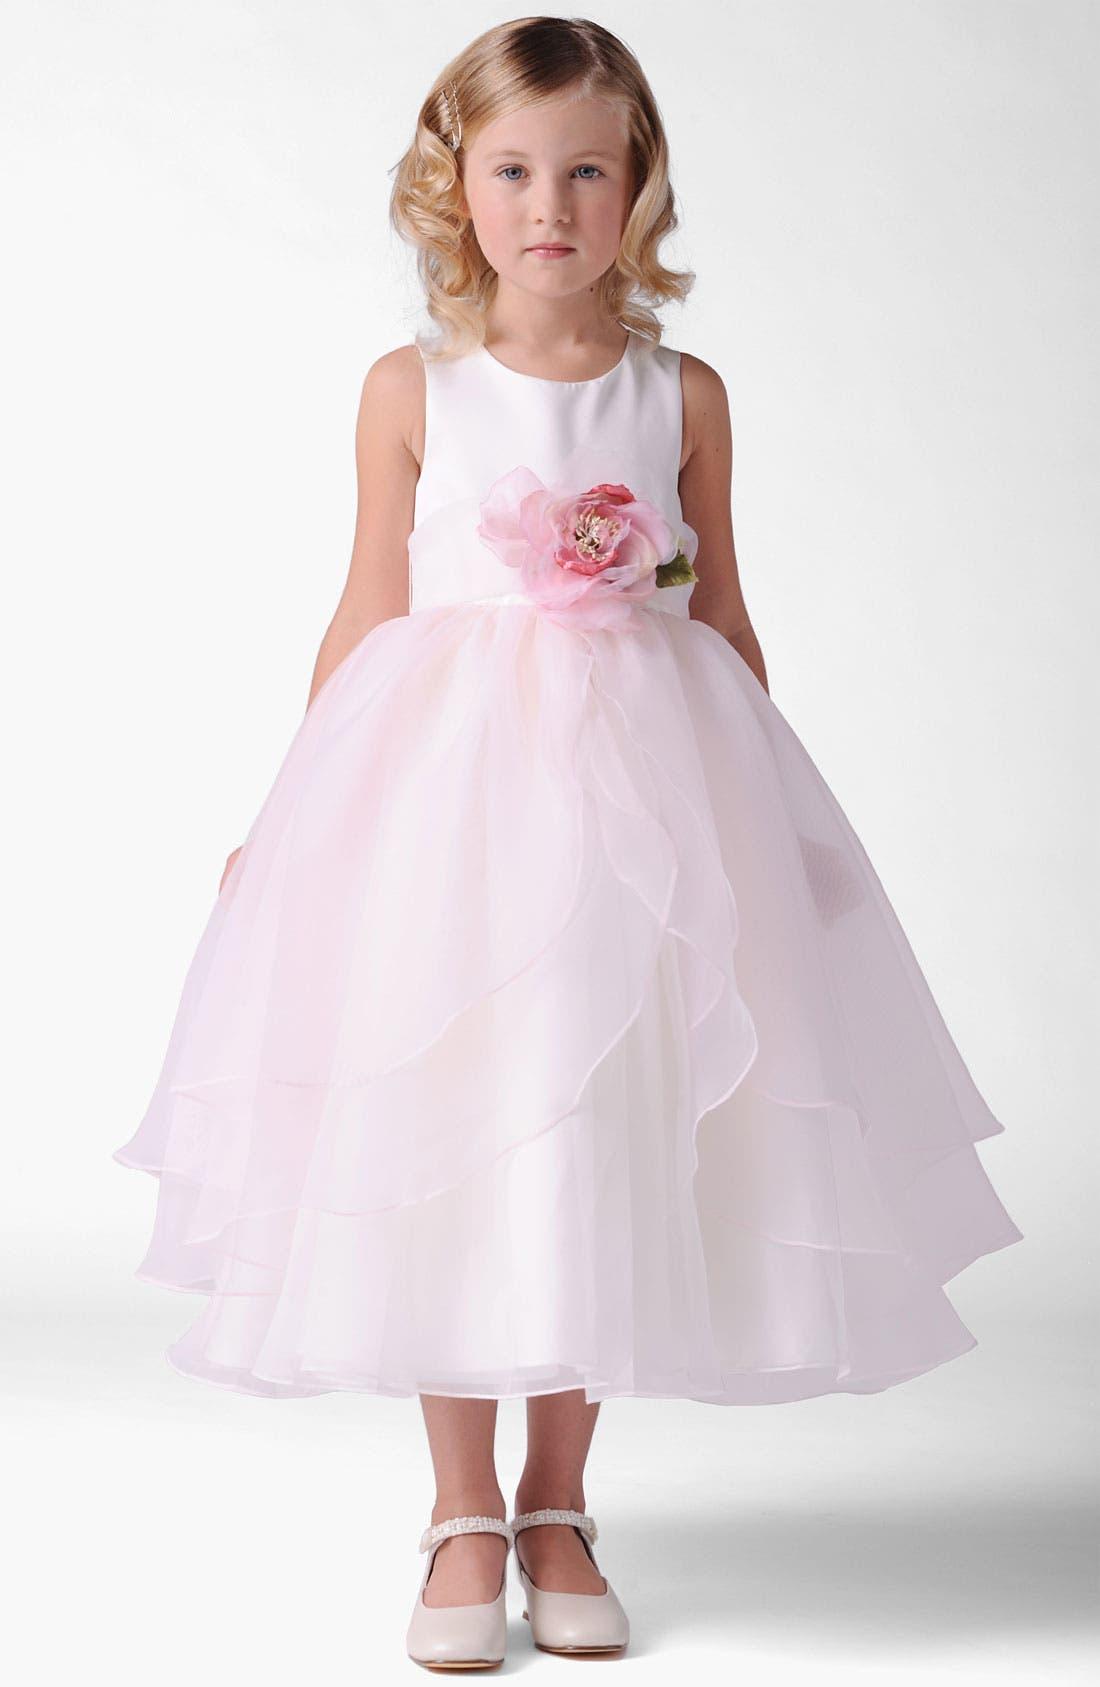 'Petal' Dress,                         Main,                         color, Ivory/ Blush Pink